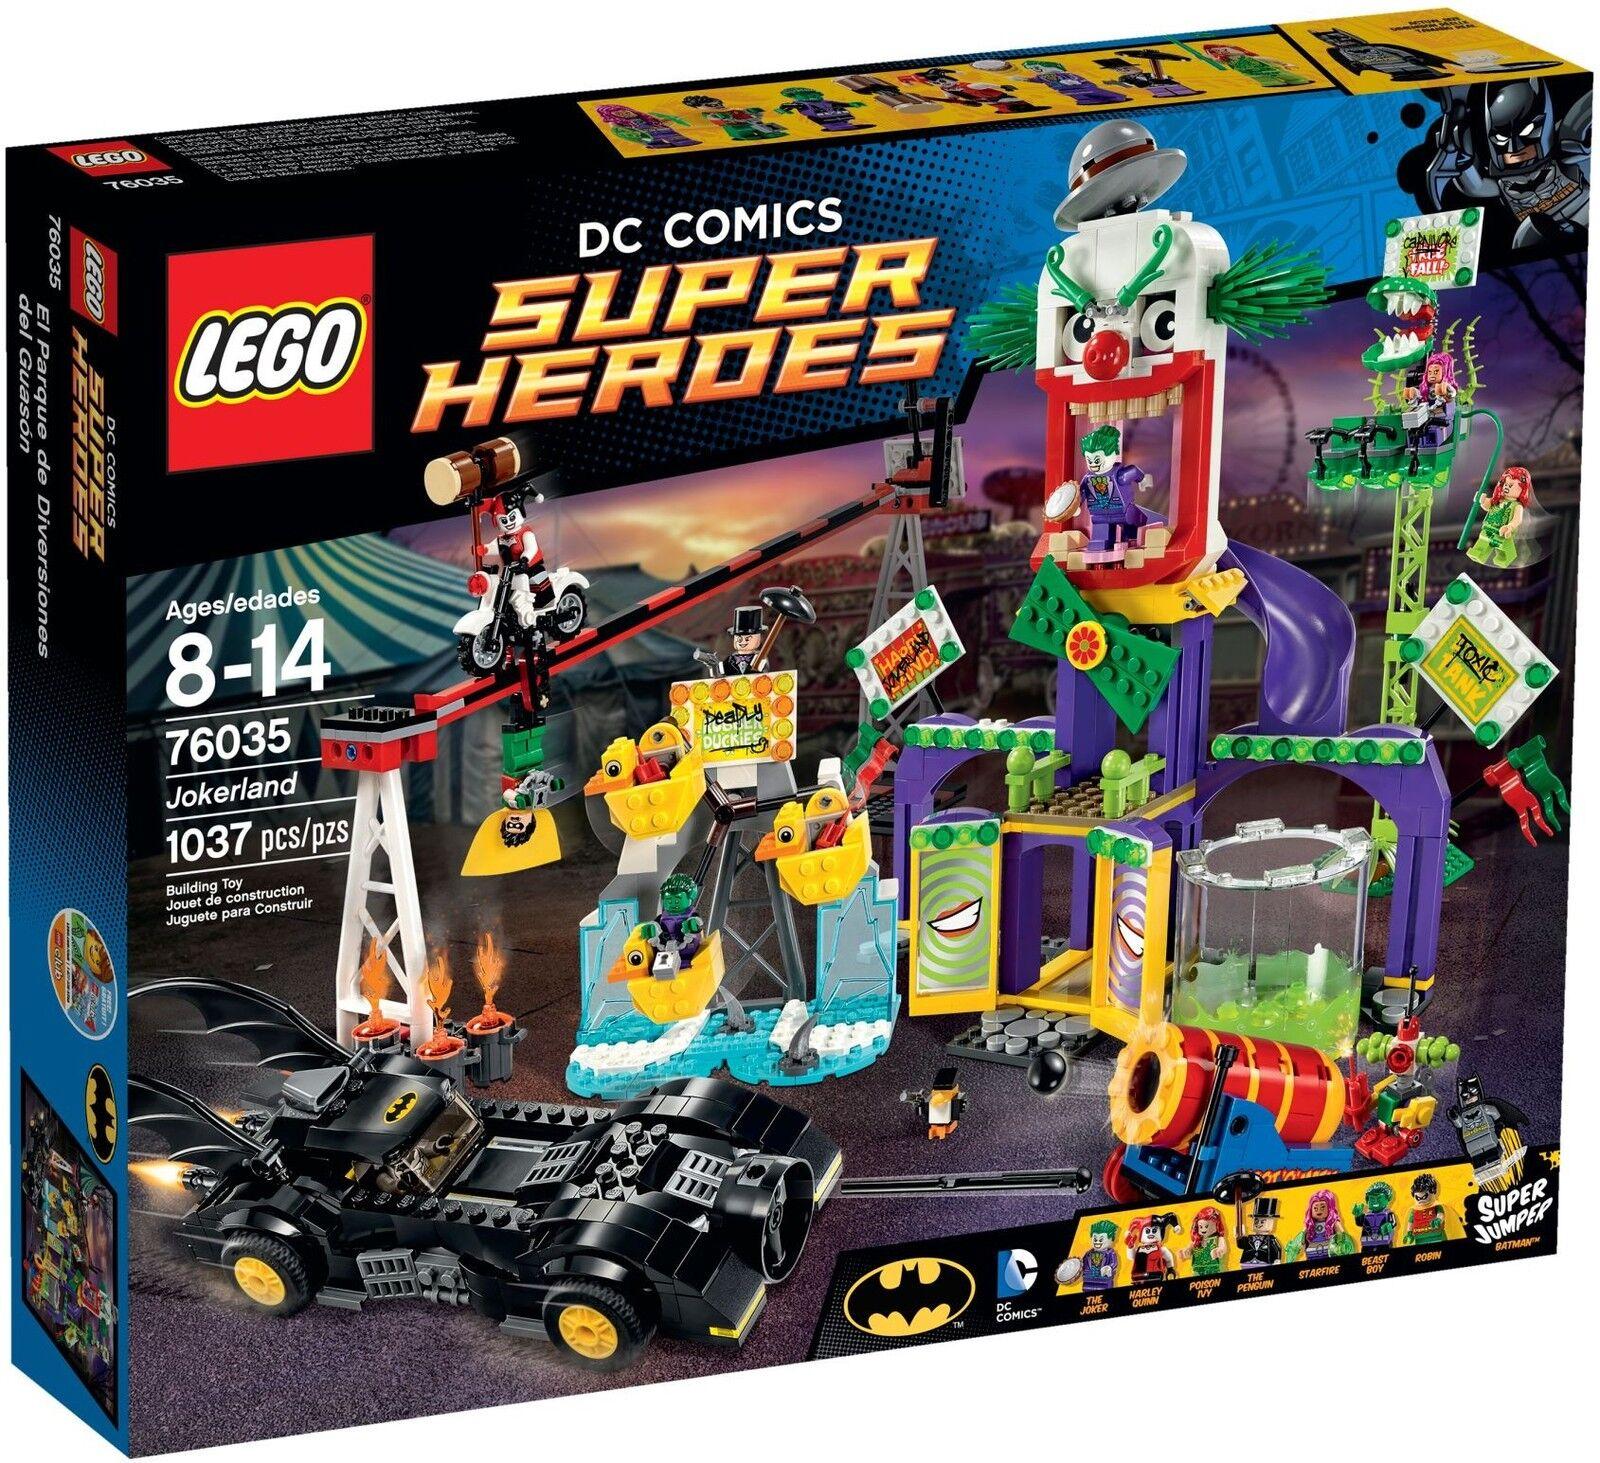 Lego DC Super Heroes - 76035 jokerland m. Joker, pingüino, Poison Ivy-nuevo & OVP